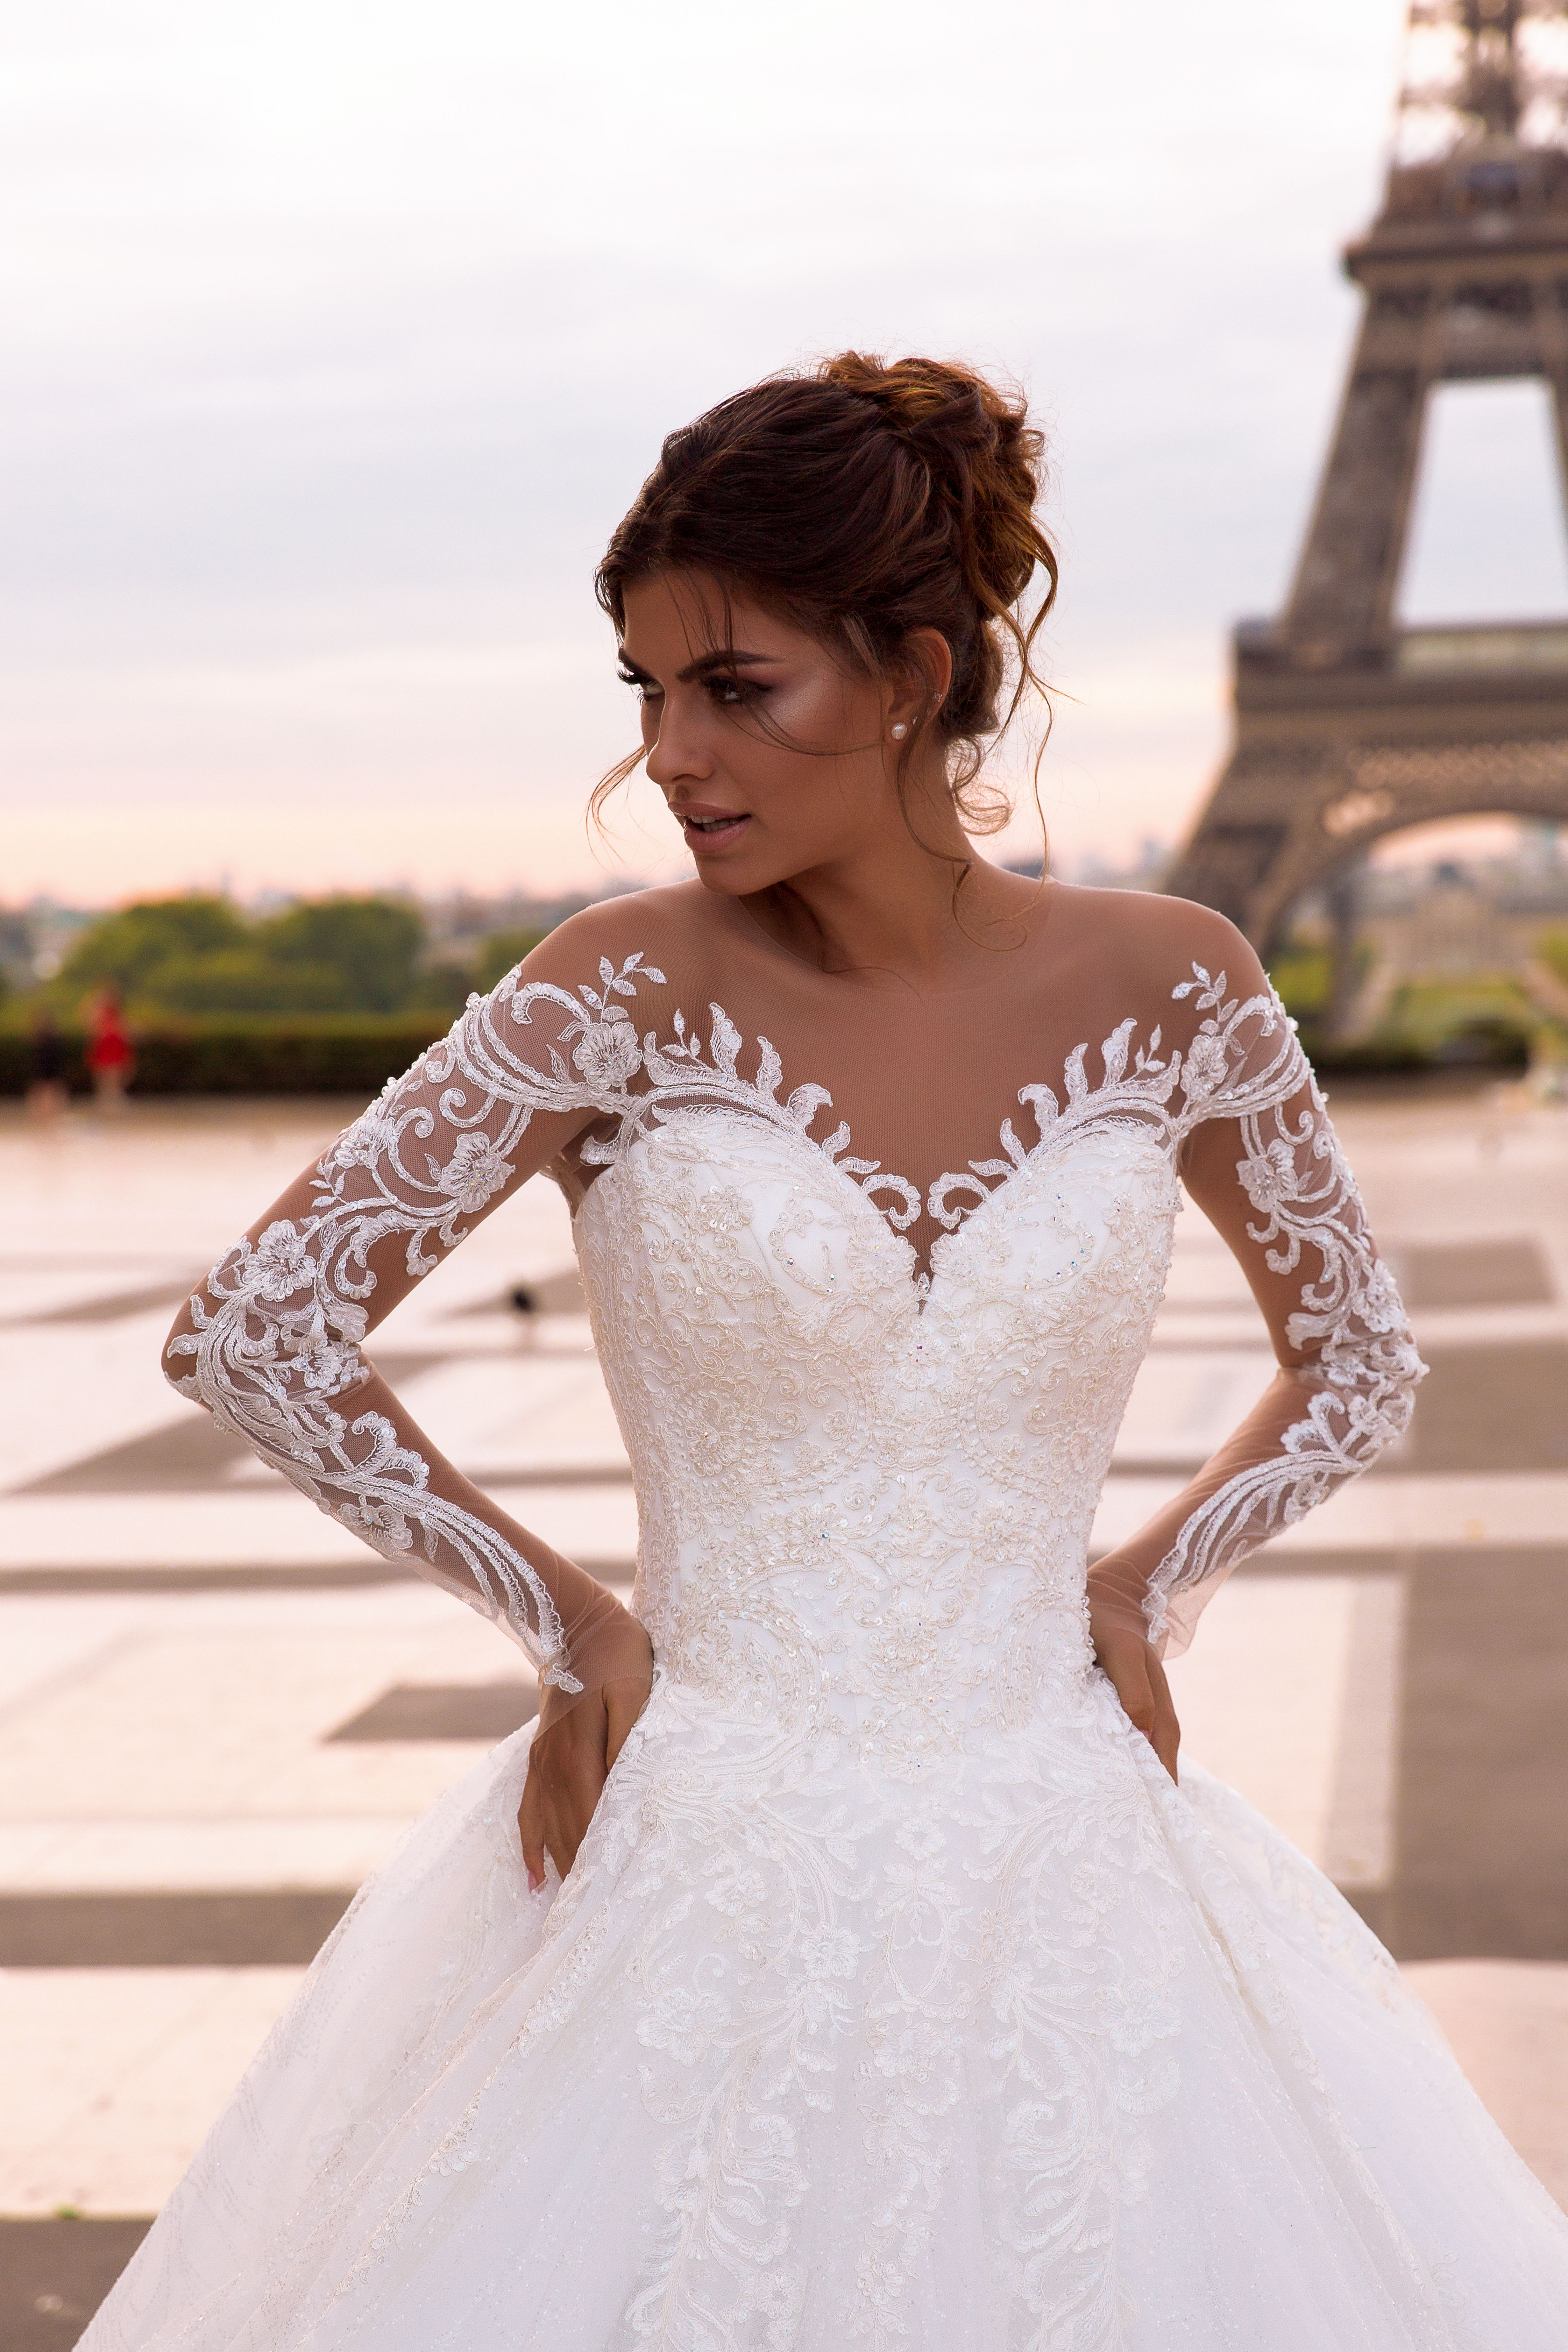 Regina Wedding Dress In 2020 Wedding Dresses Illusion Wedding Dress Satin Girls Dress